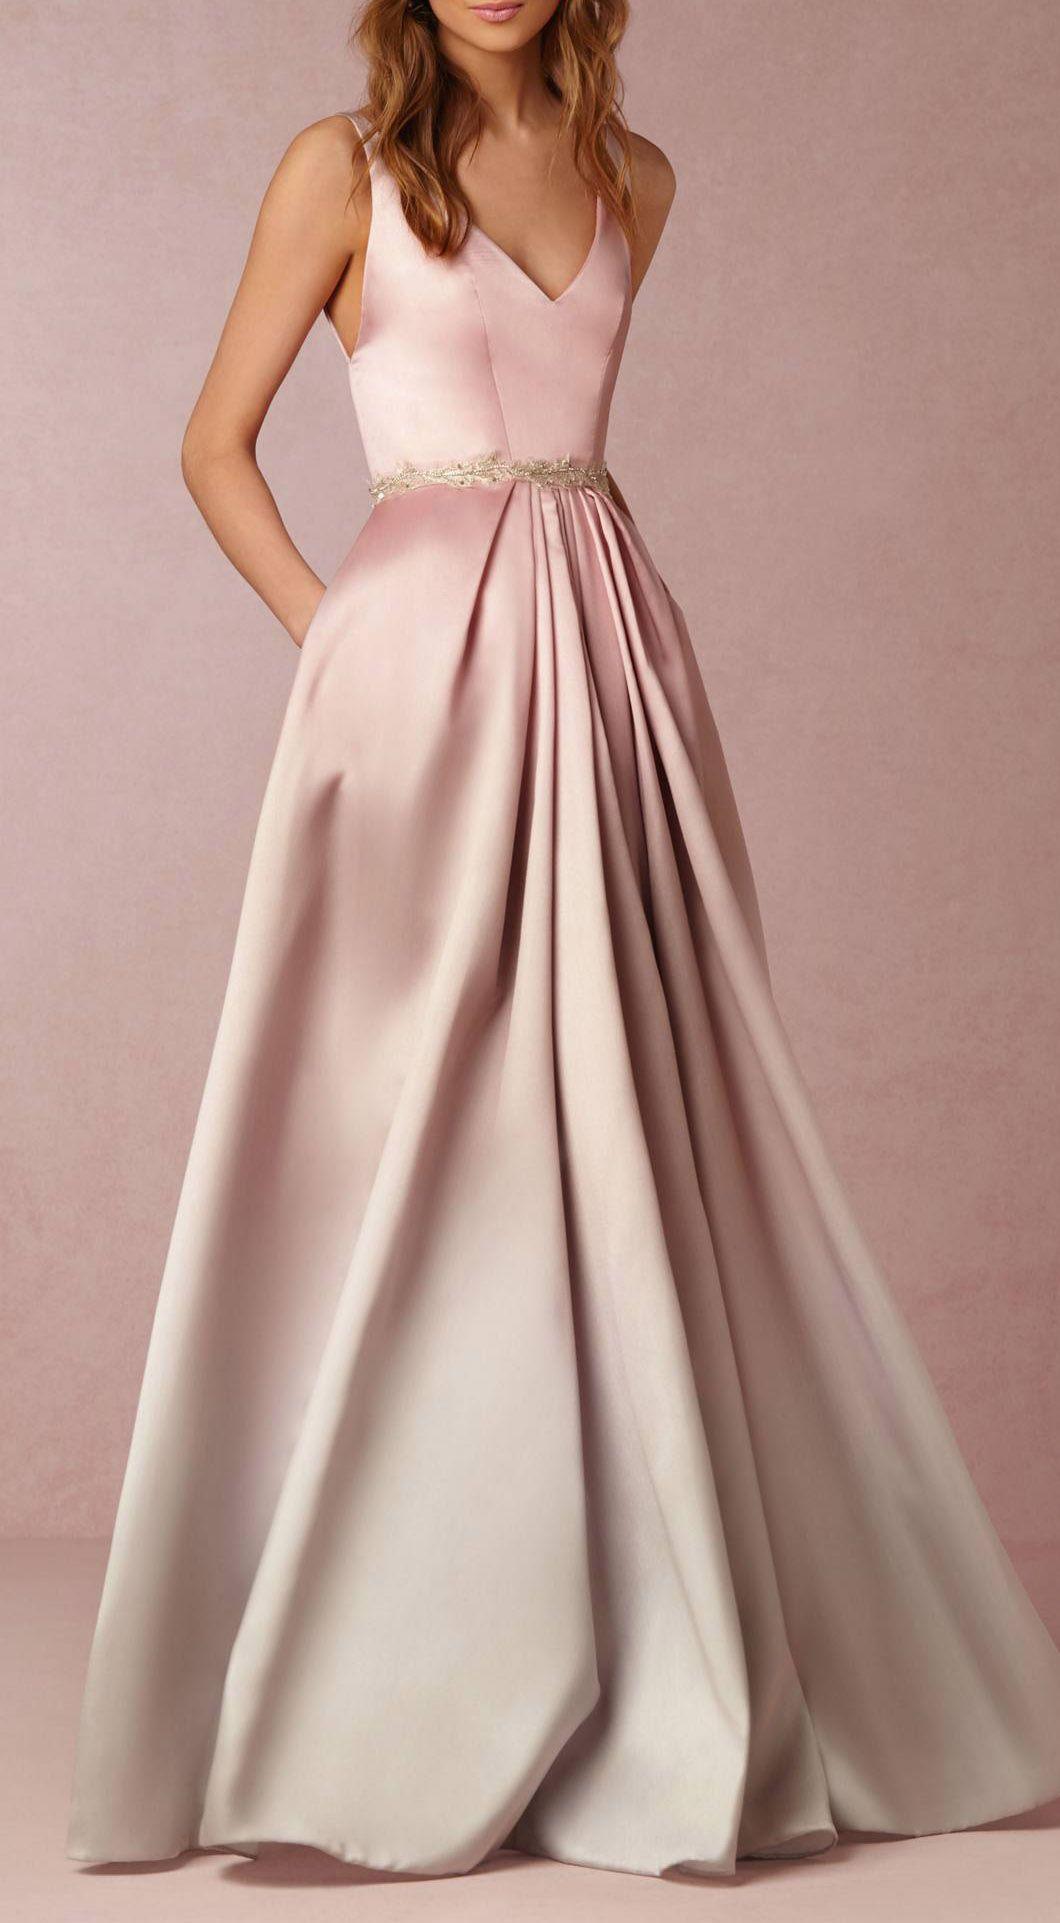 Lorraine Pink Long Dress | Vestidos | Pinterest | Graduación ...